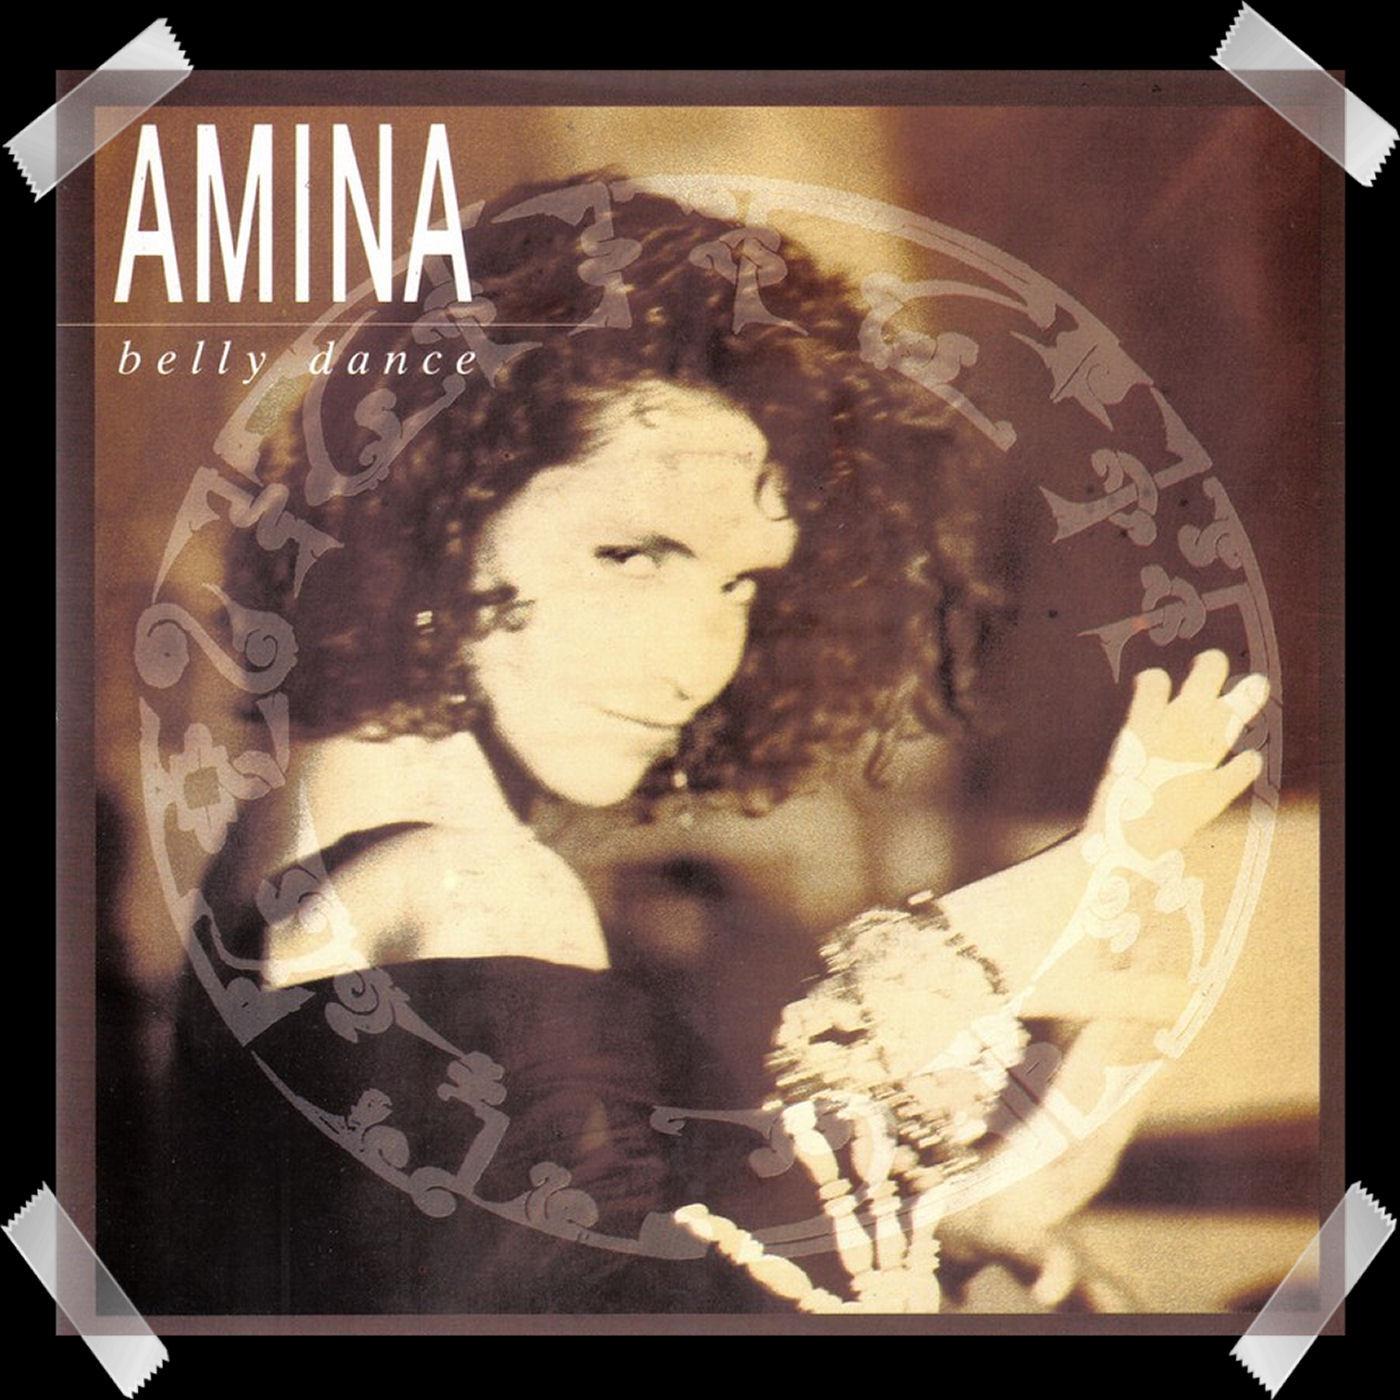 32. Amina - Belly Dance